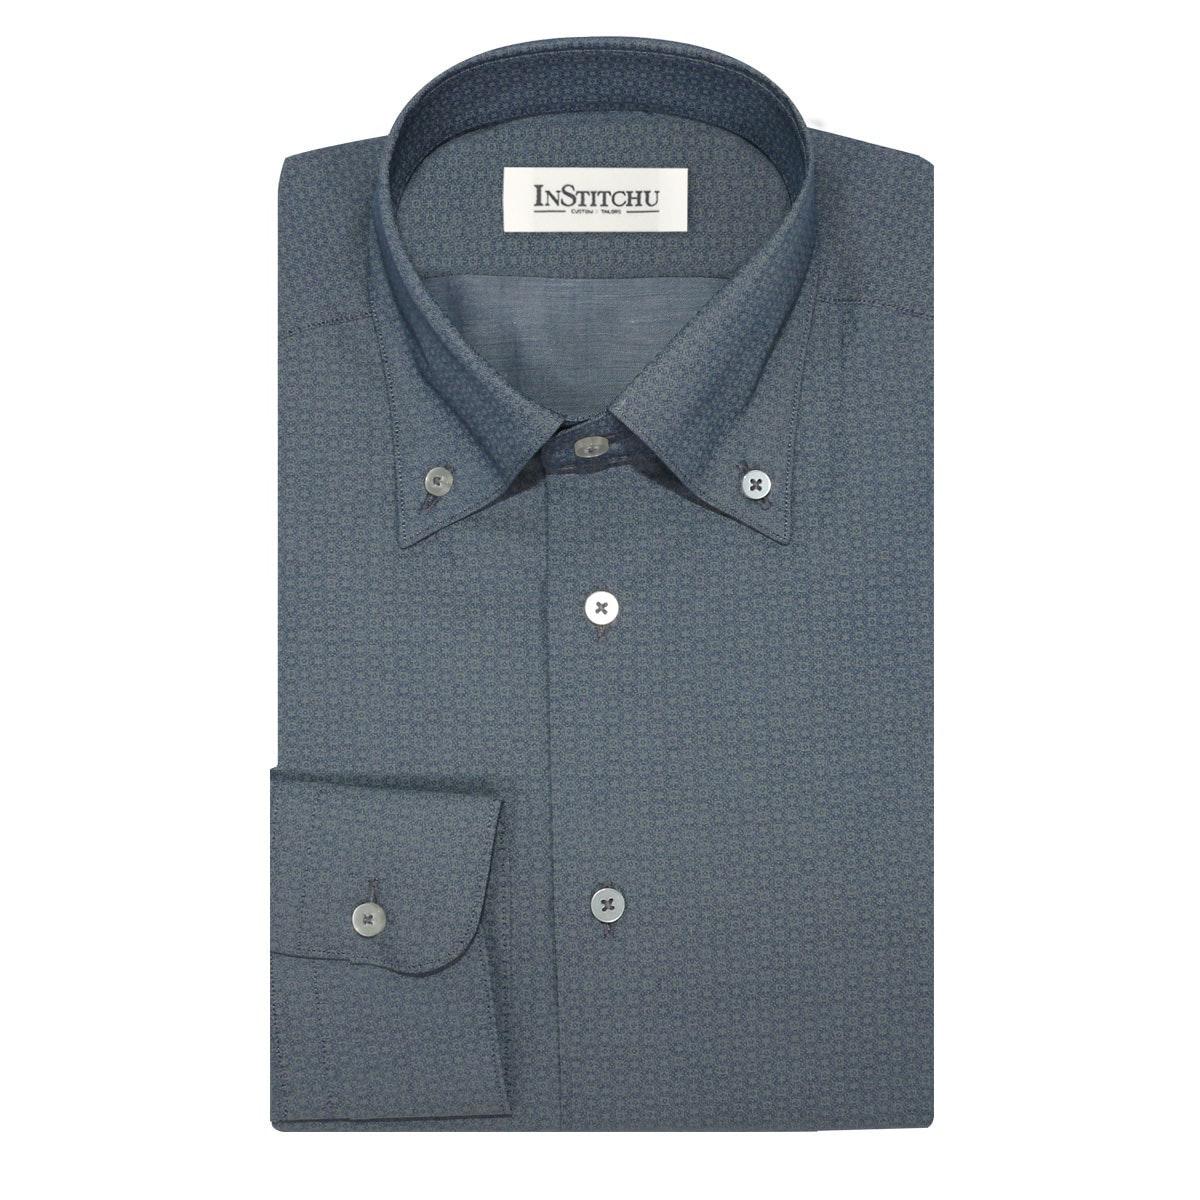 InStitchu Collection The Sunnyside Olive Print Shirt